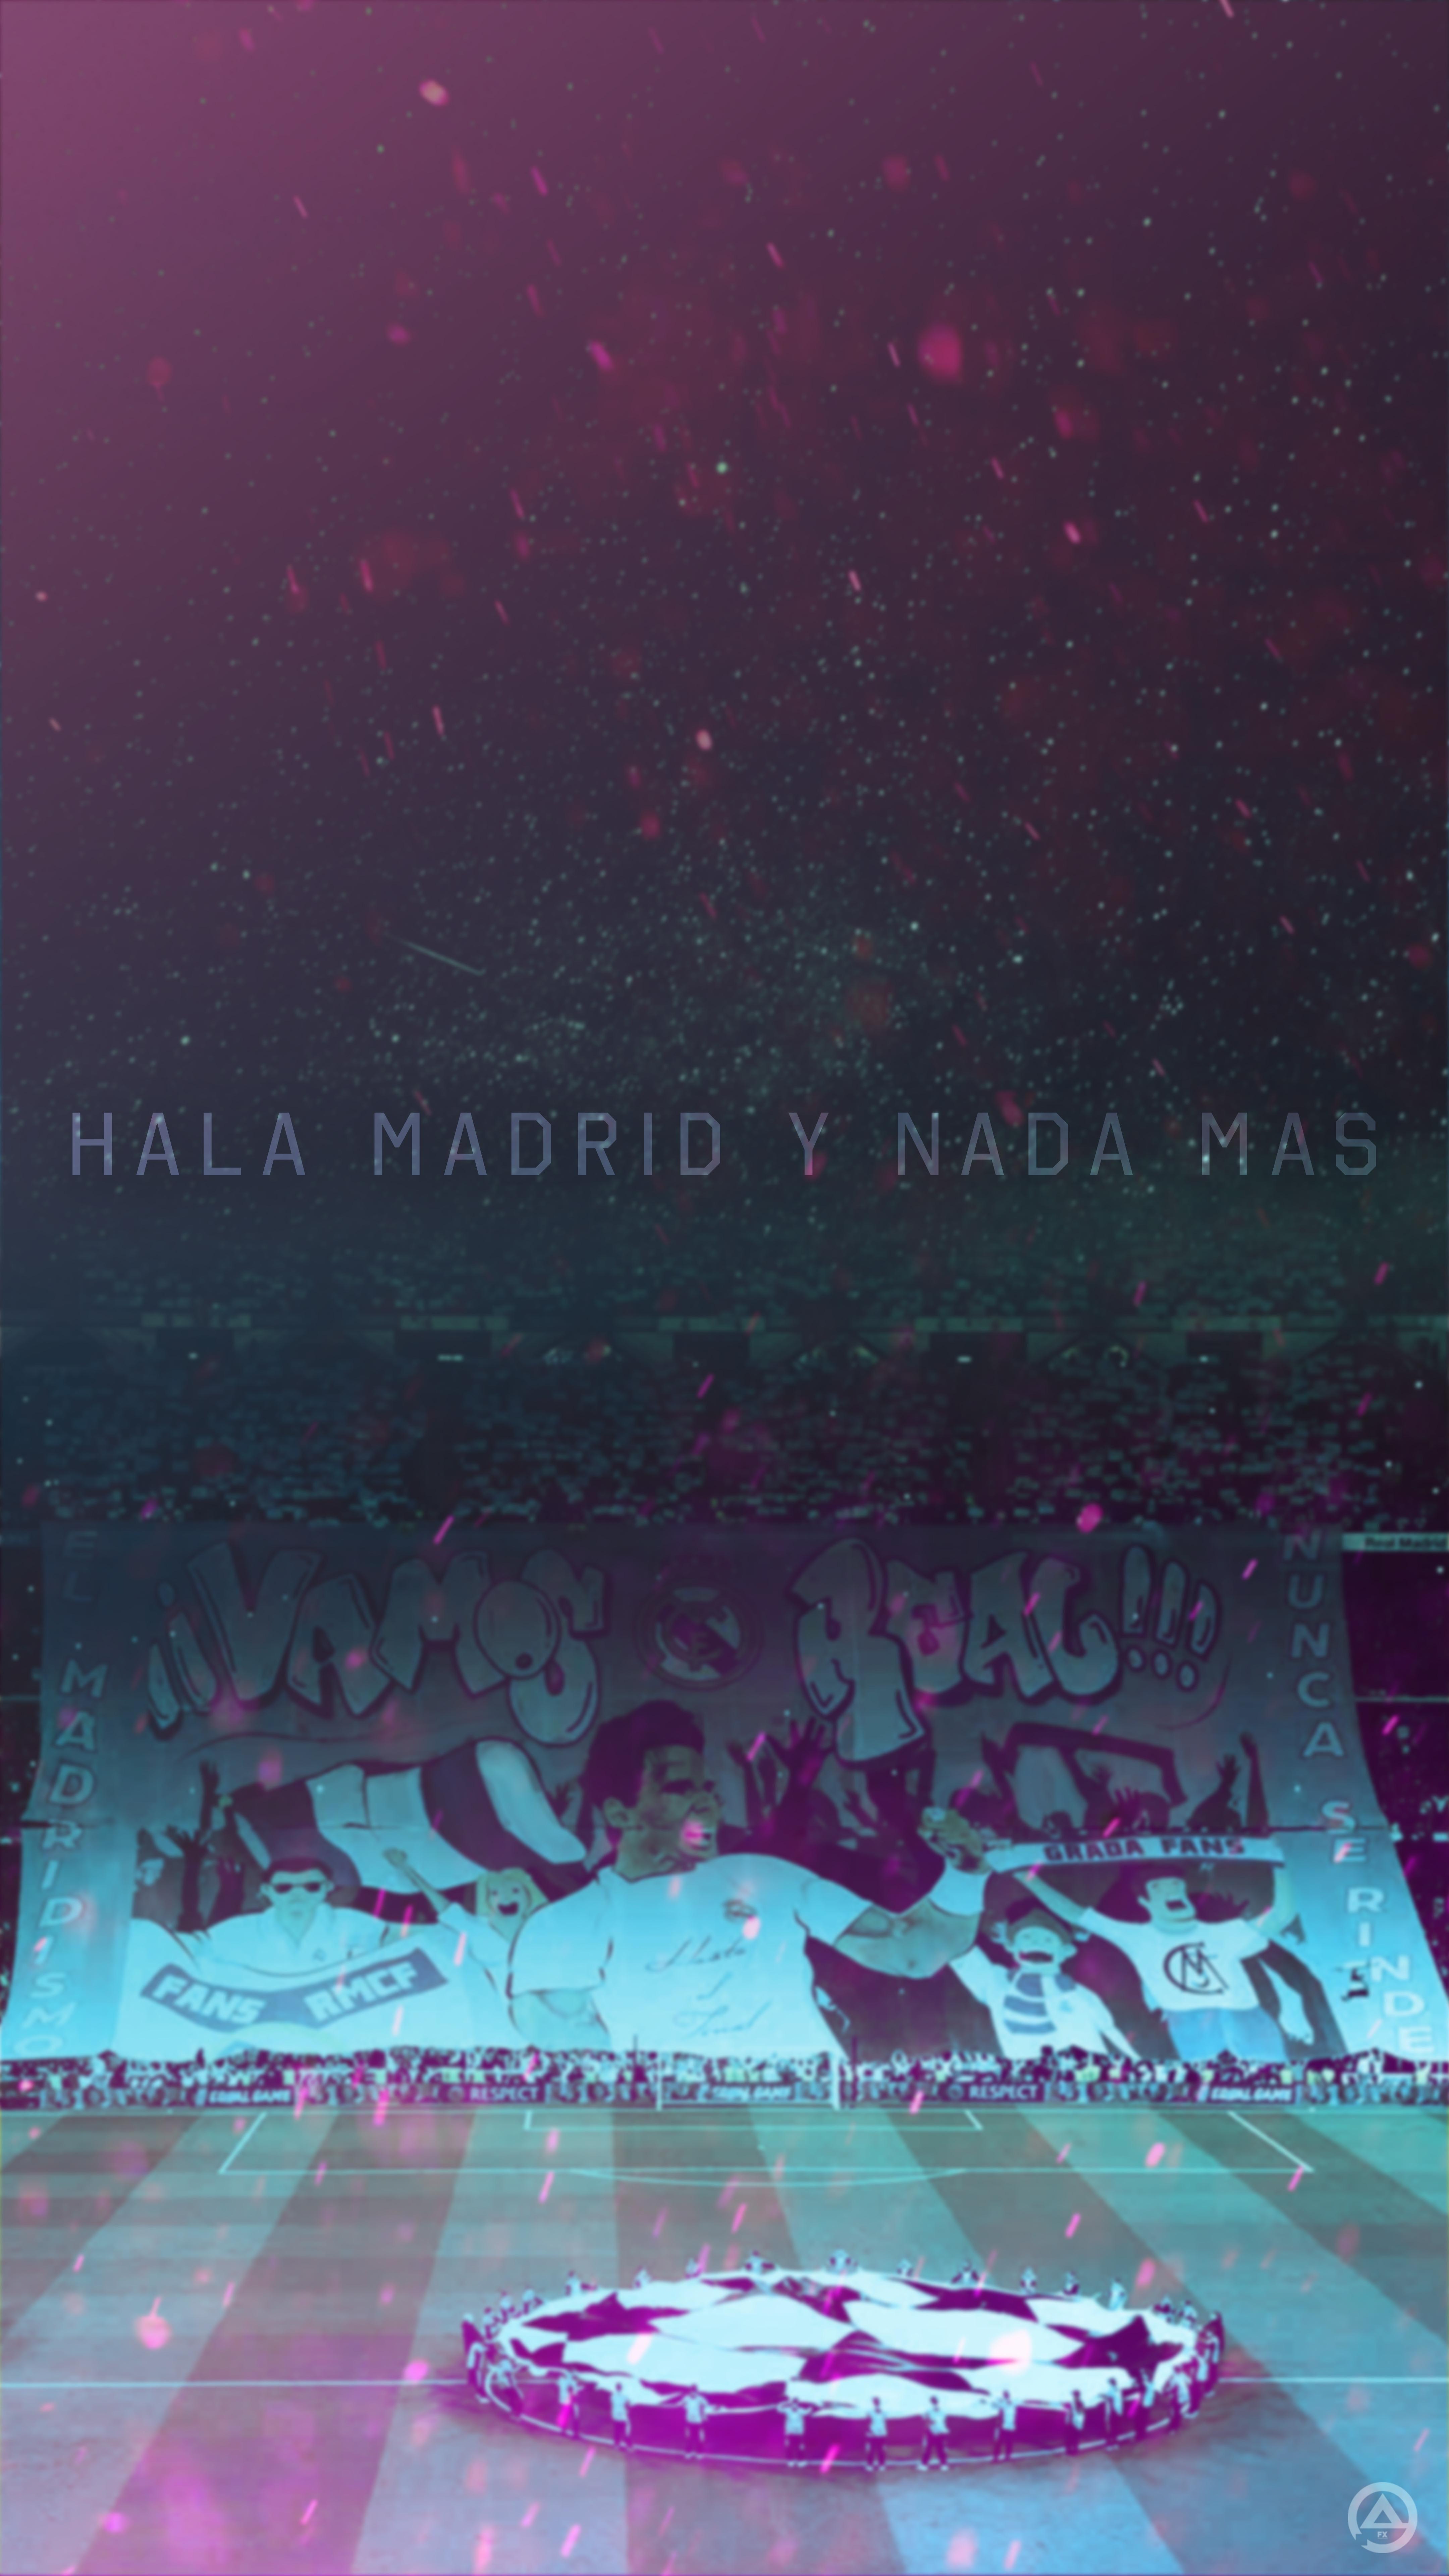 Hala Madrid Y Nada Mas From Psg Game Lockscreen Real Madrid Wallpapers Real Madrid Logo Real Madrid Football